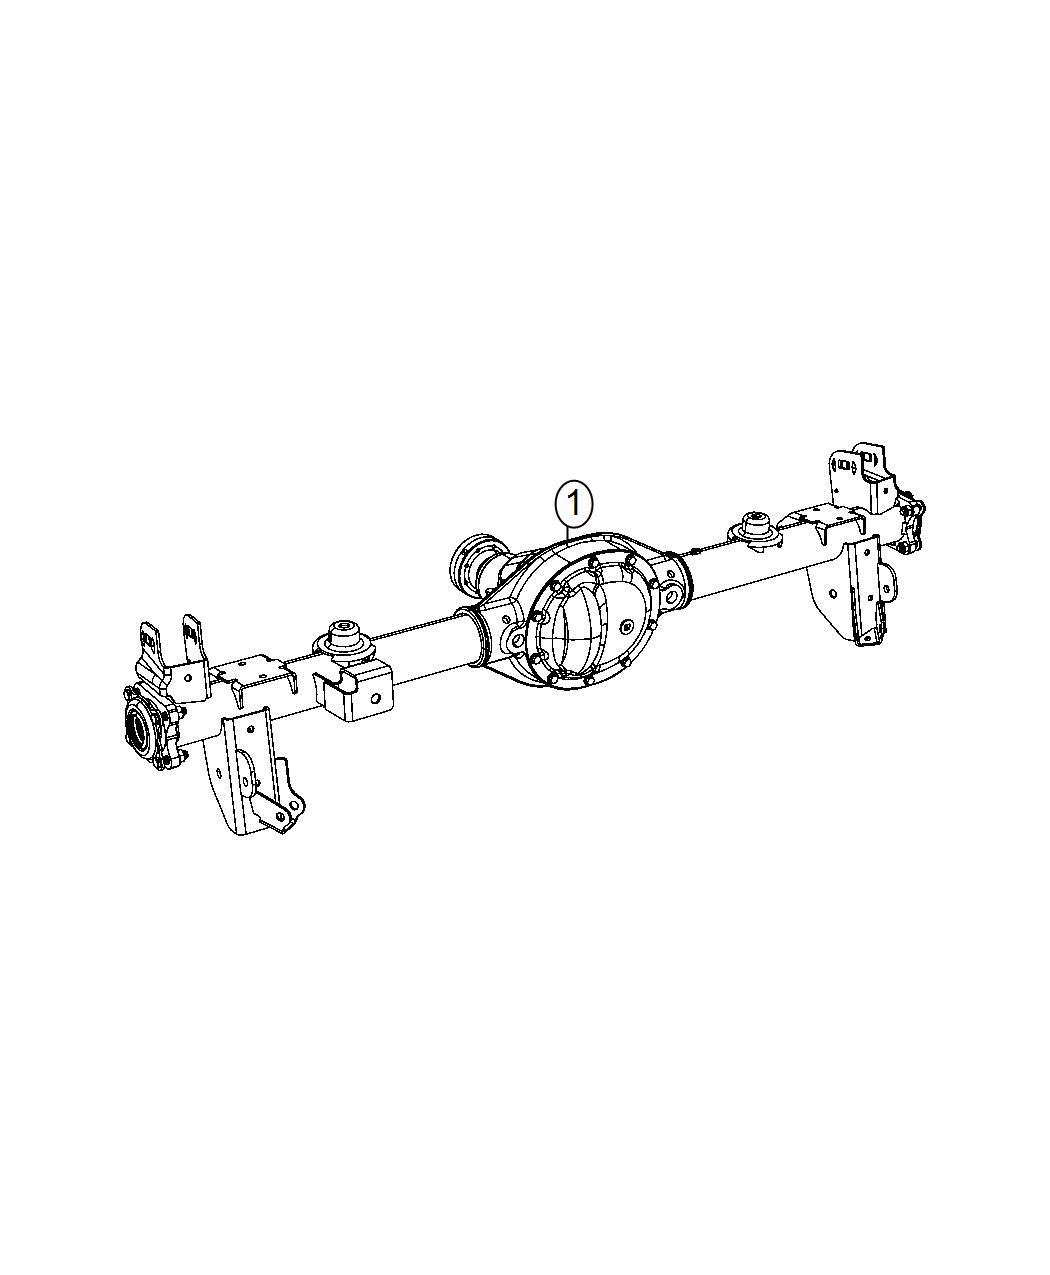 Jeep Wrangler Axle Service Rear 4 10 Rear Axle